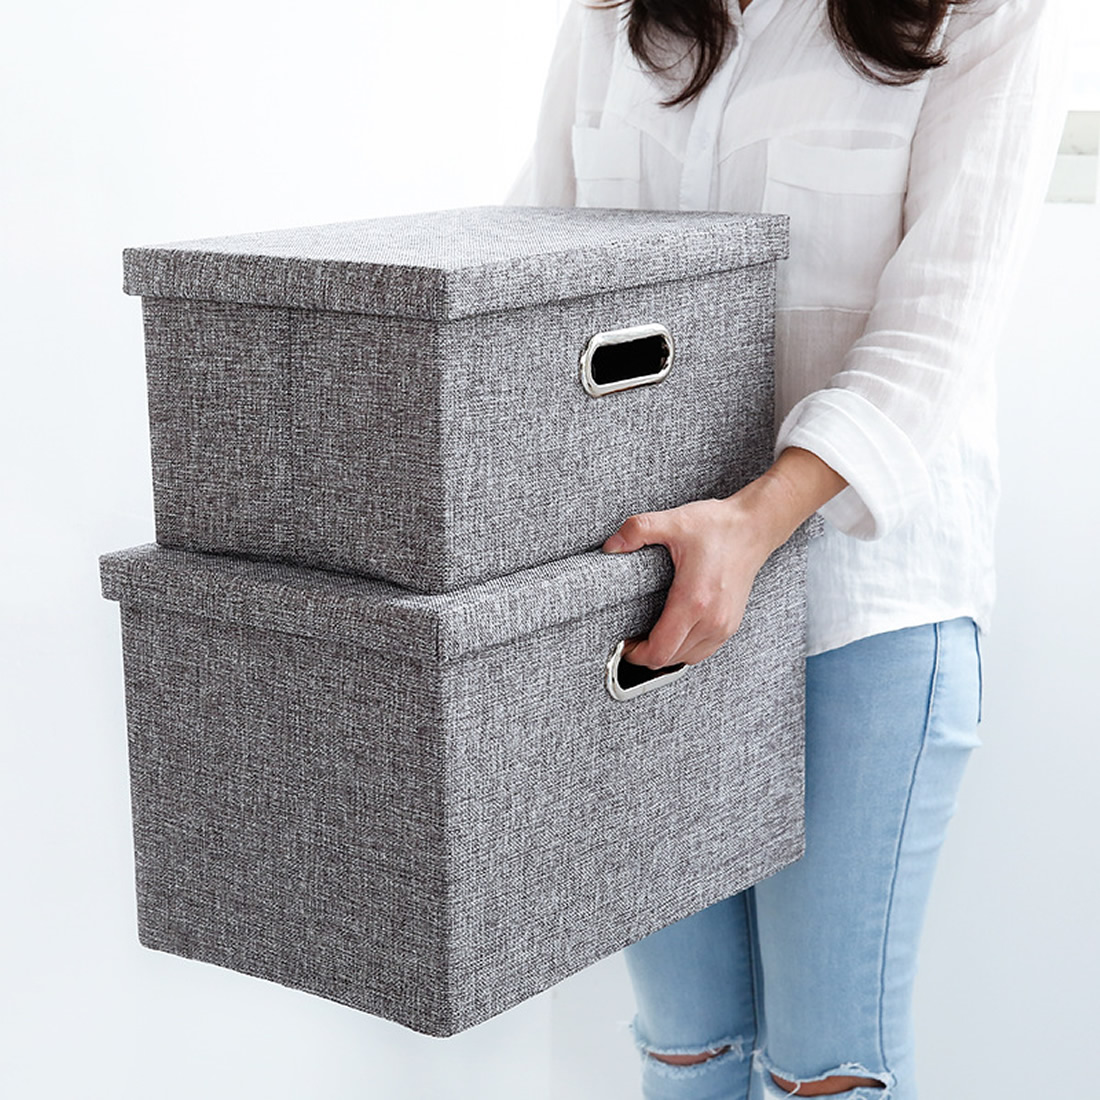 2019 New Wardrobe Kids Organizer Bins Box For Toys: Creative Laundry Box Clothes Storage Boxes Bra Necktie